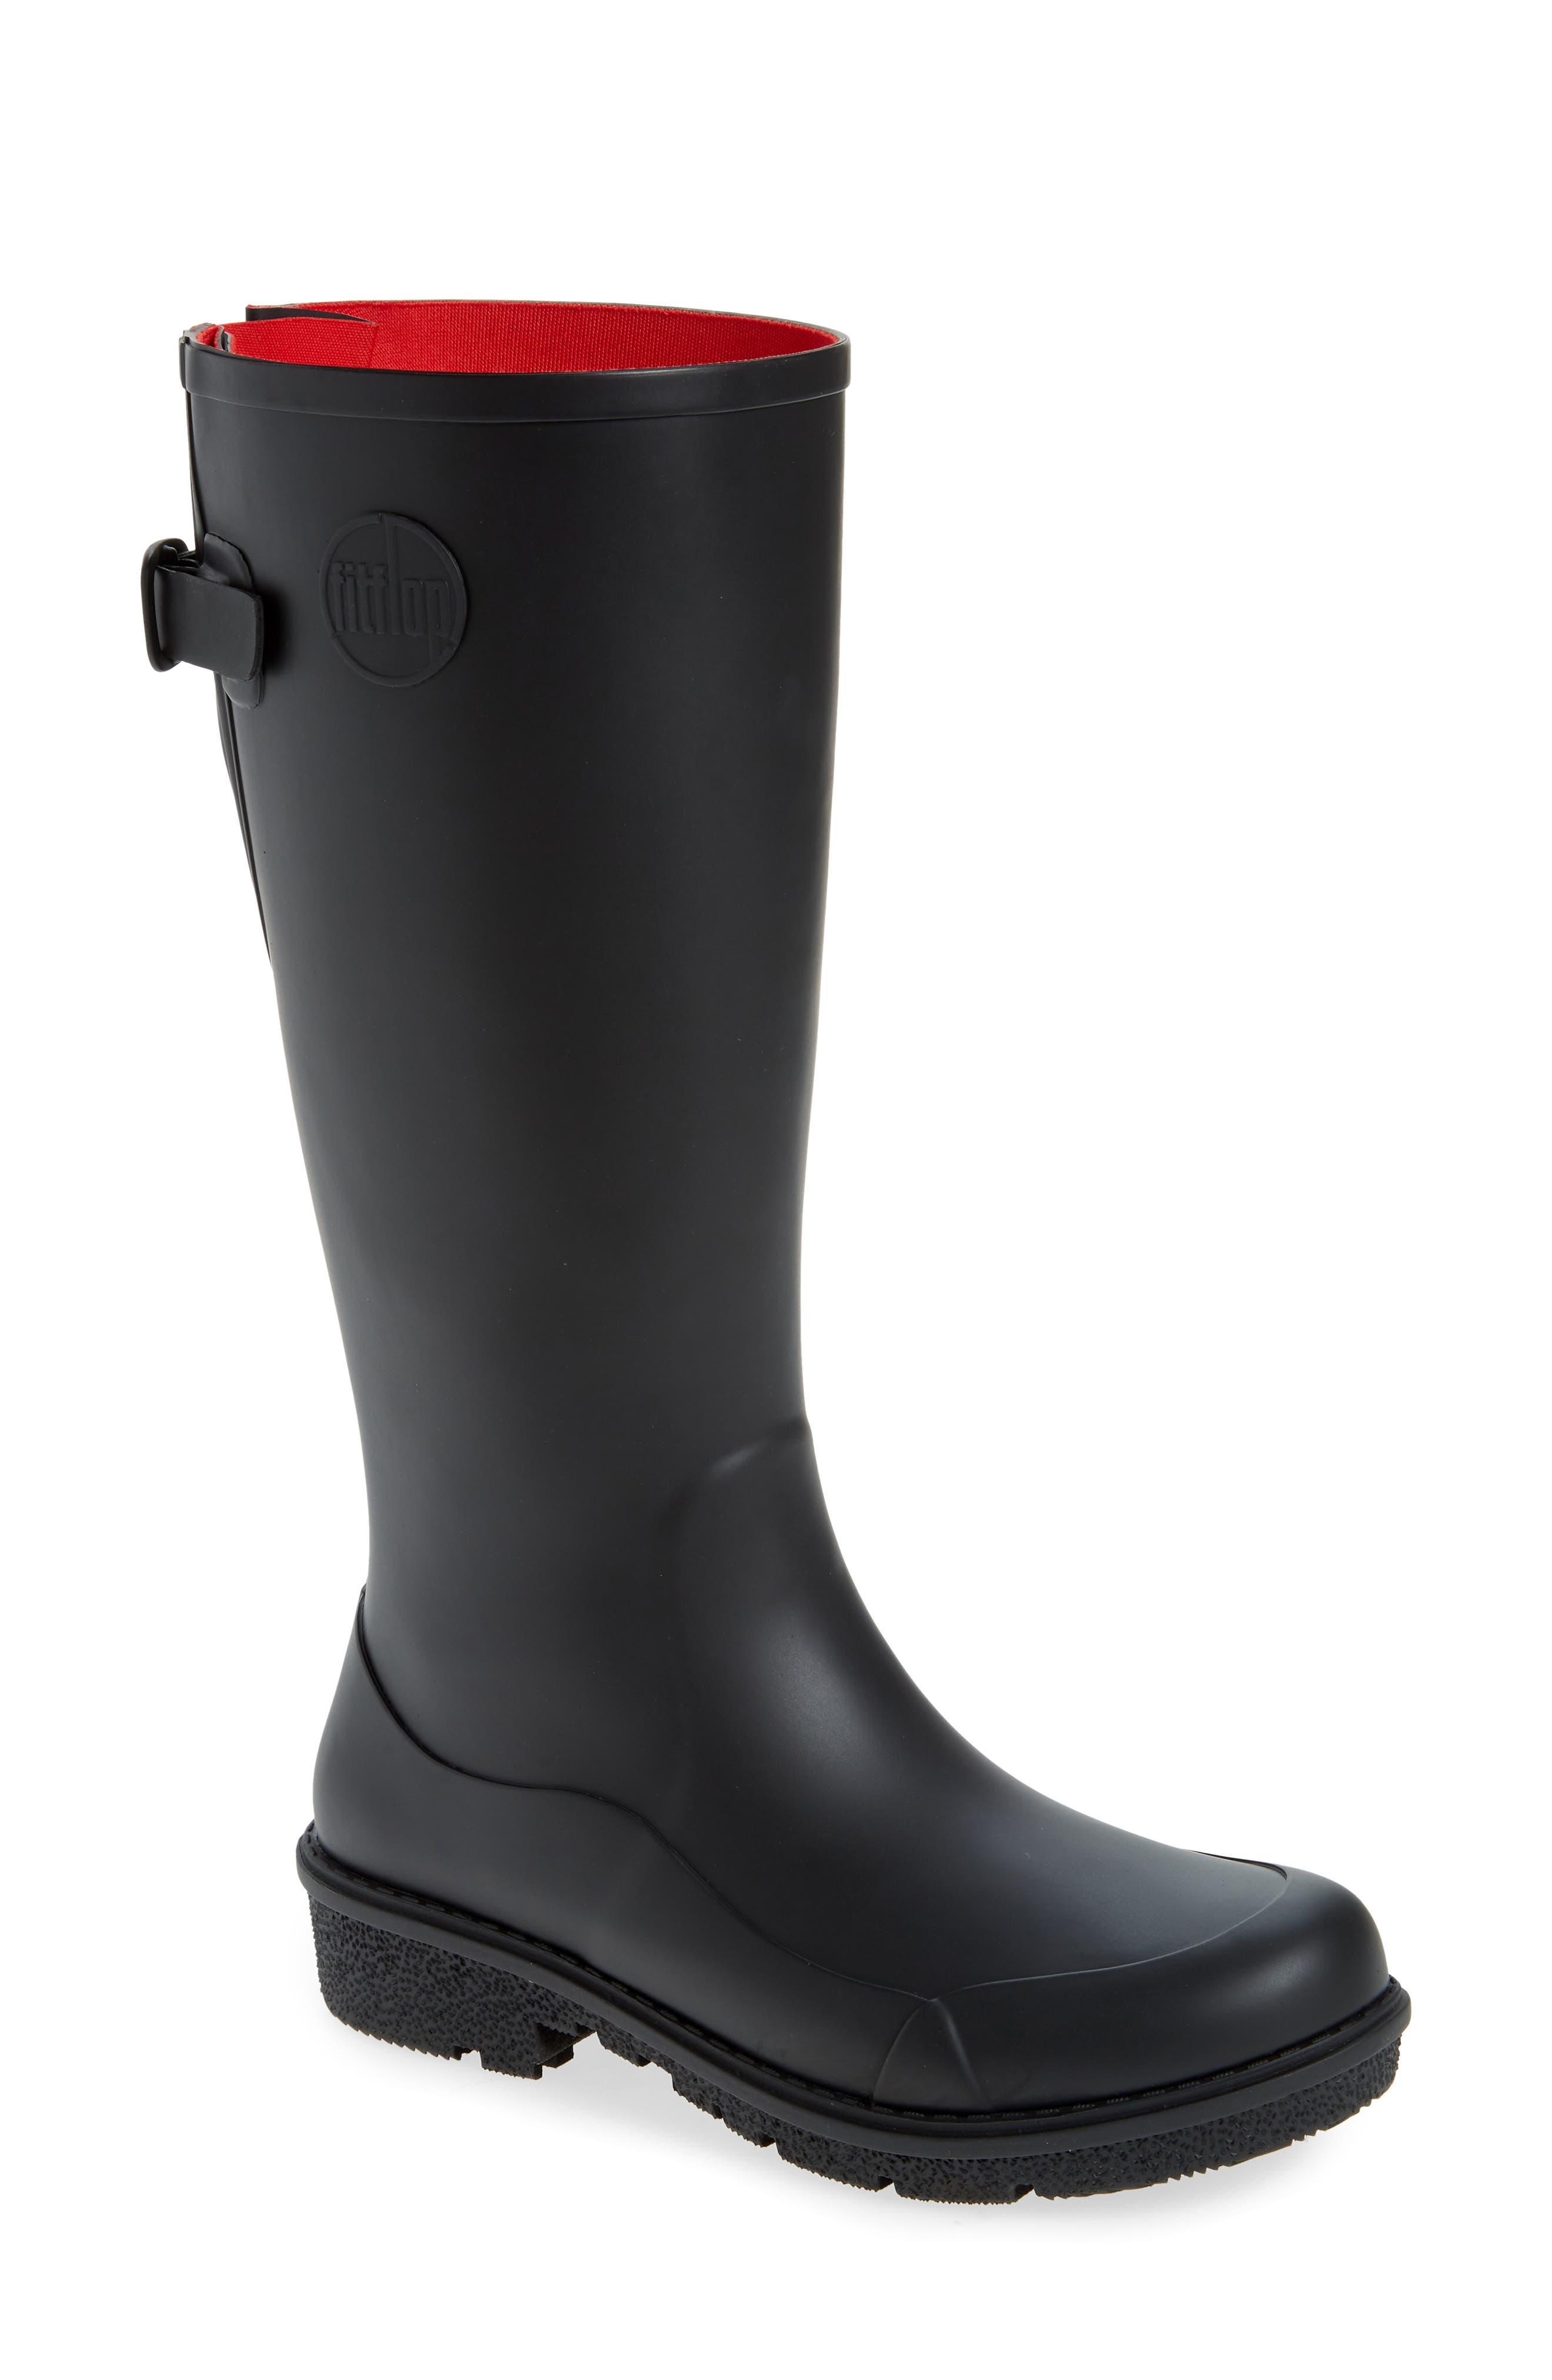 Wonderwelly Waterproof Rain Boot